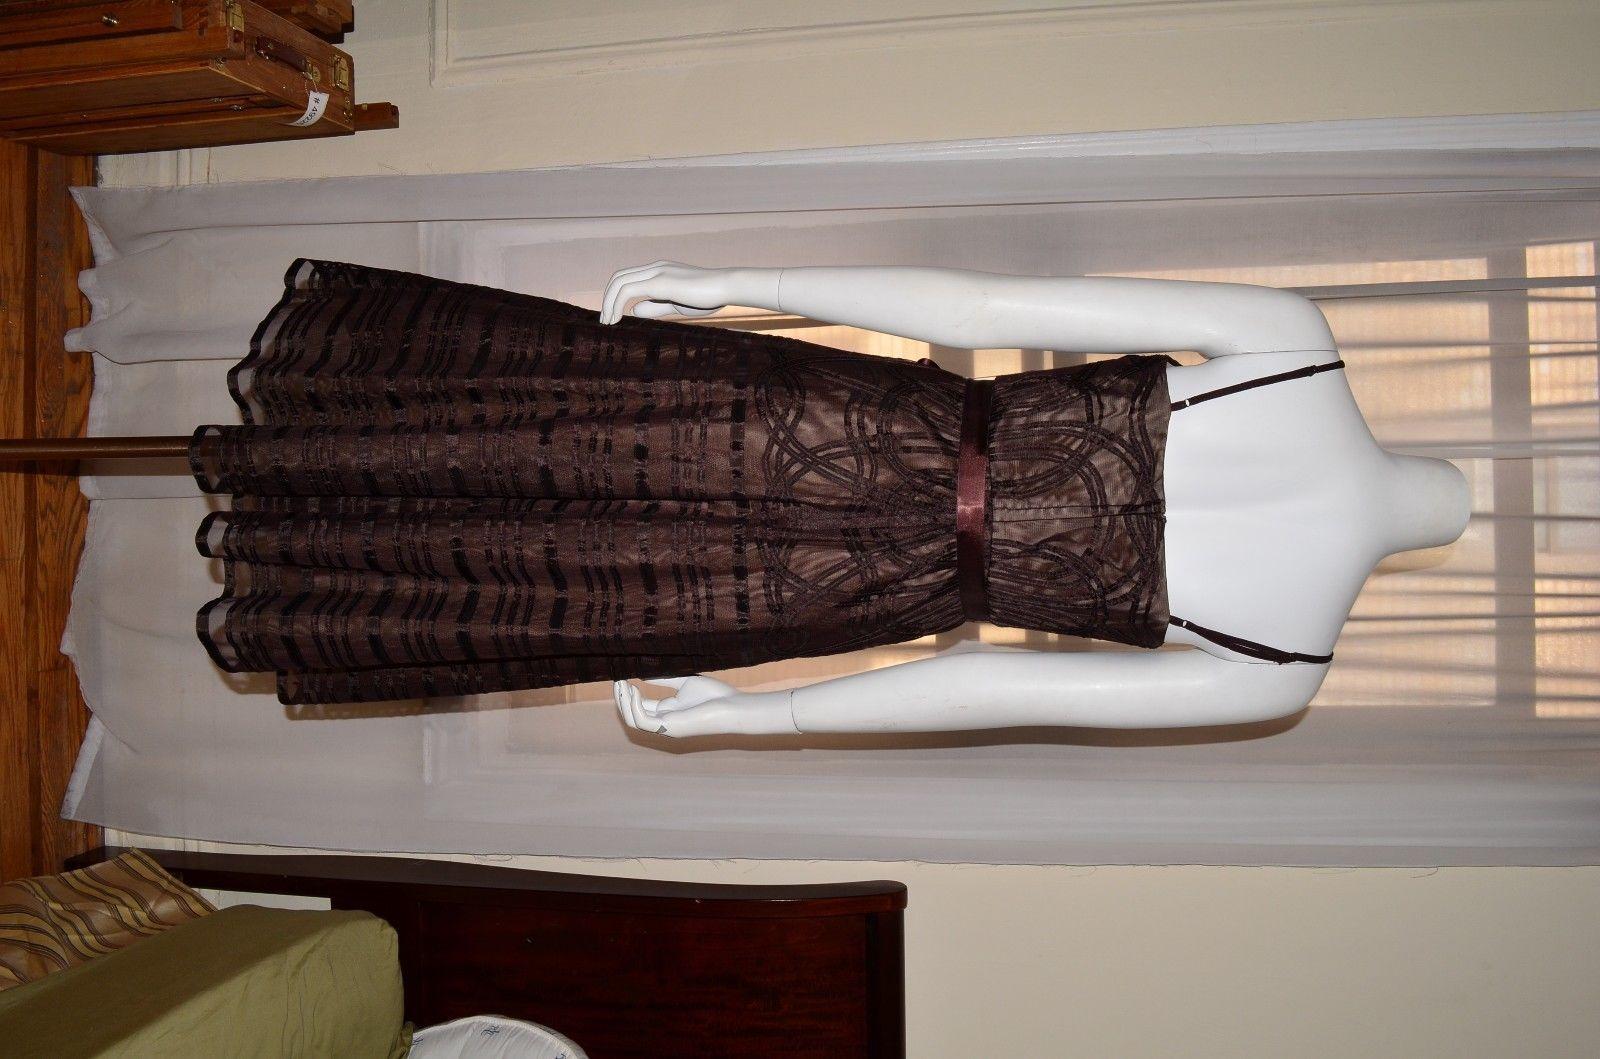 BCBG MAXAZRIA Evening Brown Cocktail Party Prom Dress Gown sz 6 Small S Max Azri